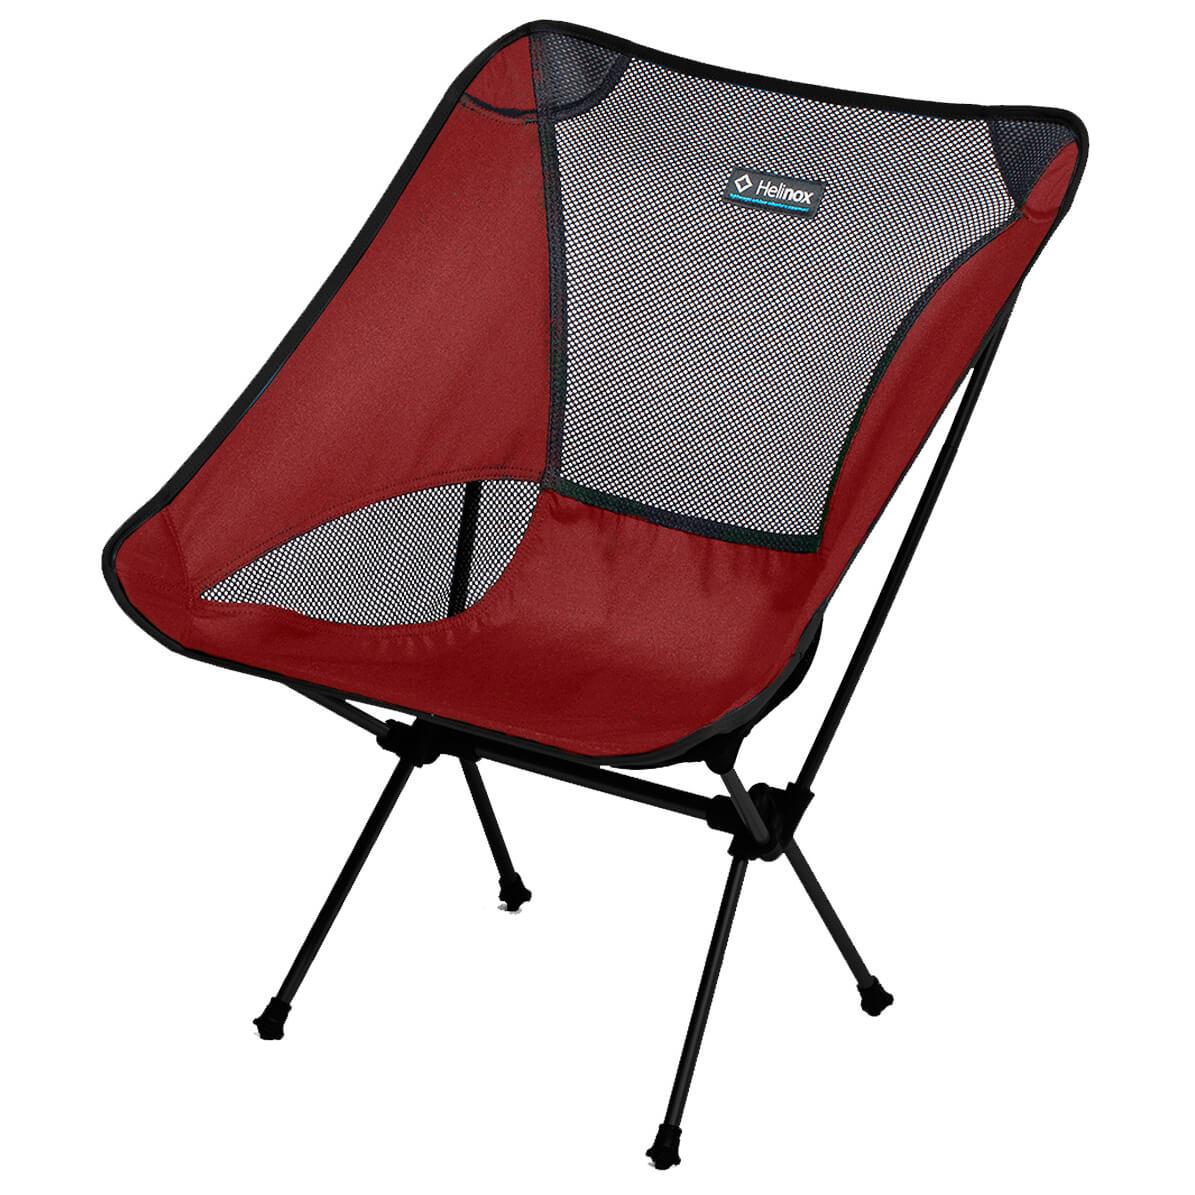 helinox chair one campingstuhl versandkostenfrei. Black Bedroom Furniture Sets. Home Design Ideas